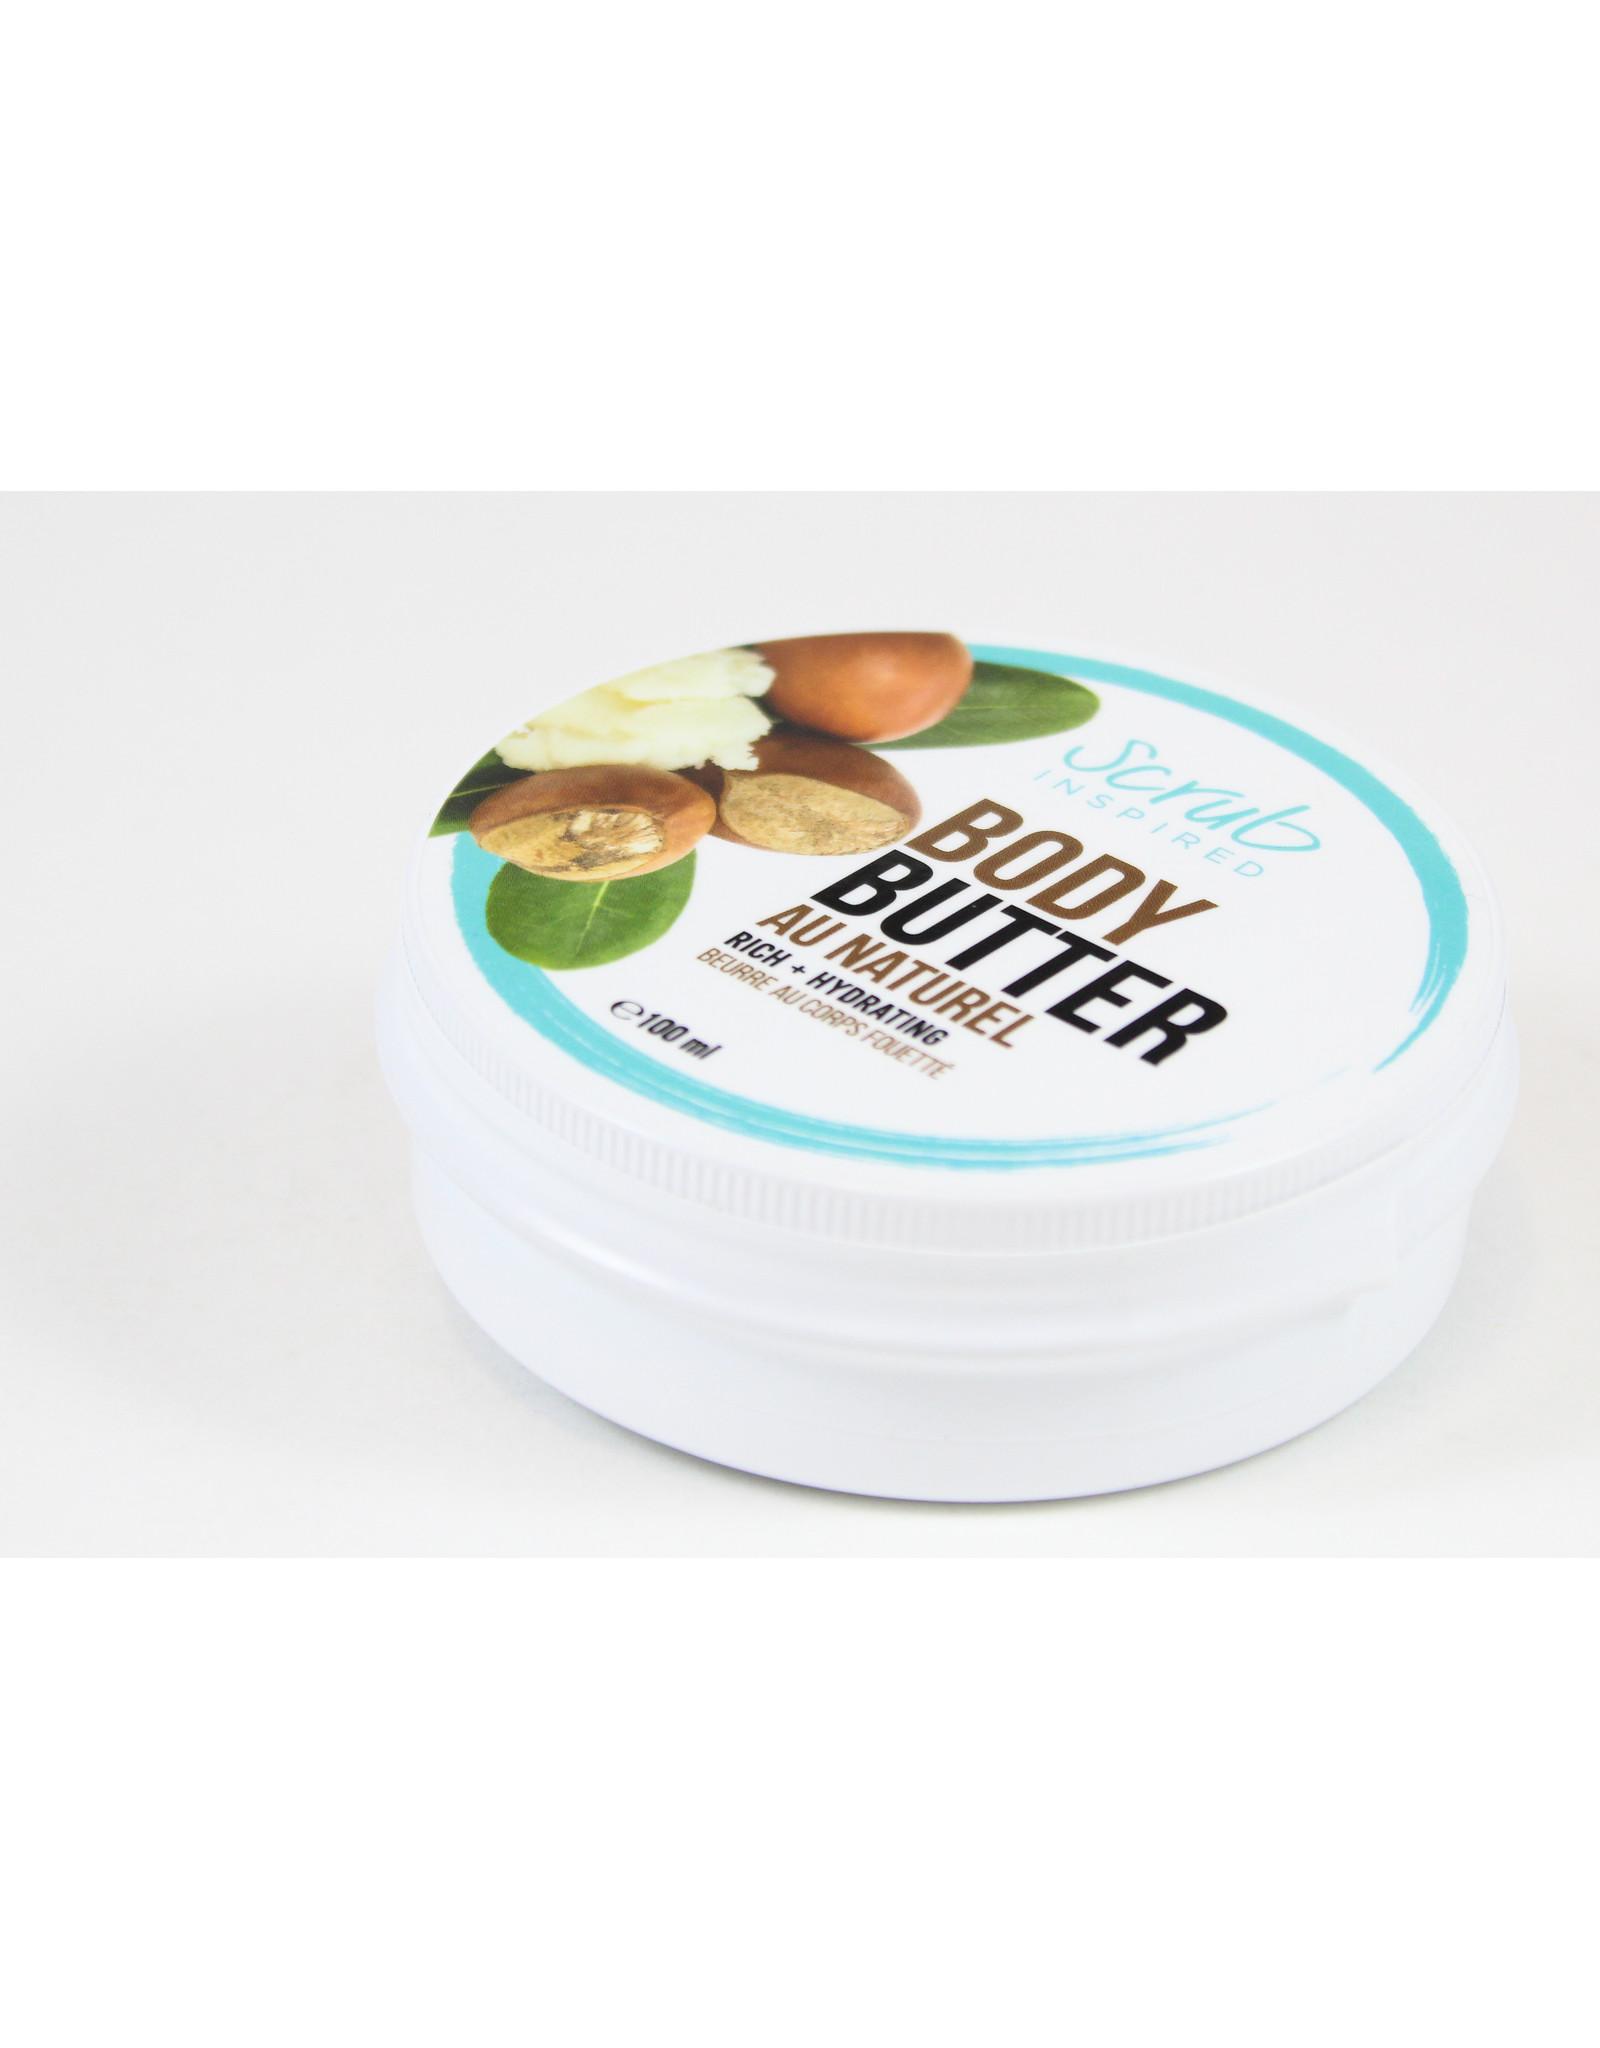 Scrub Inspired Au Naturel Body Butter by Scrub Inspired